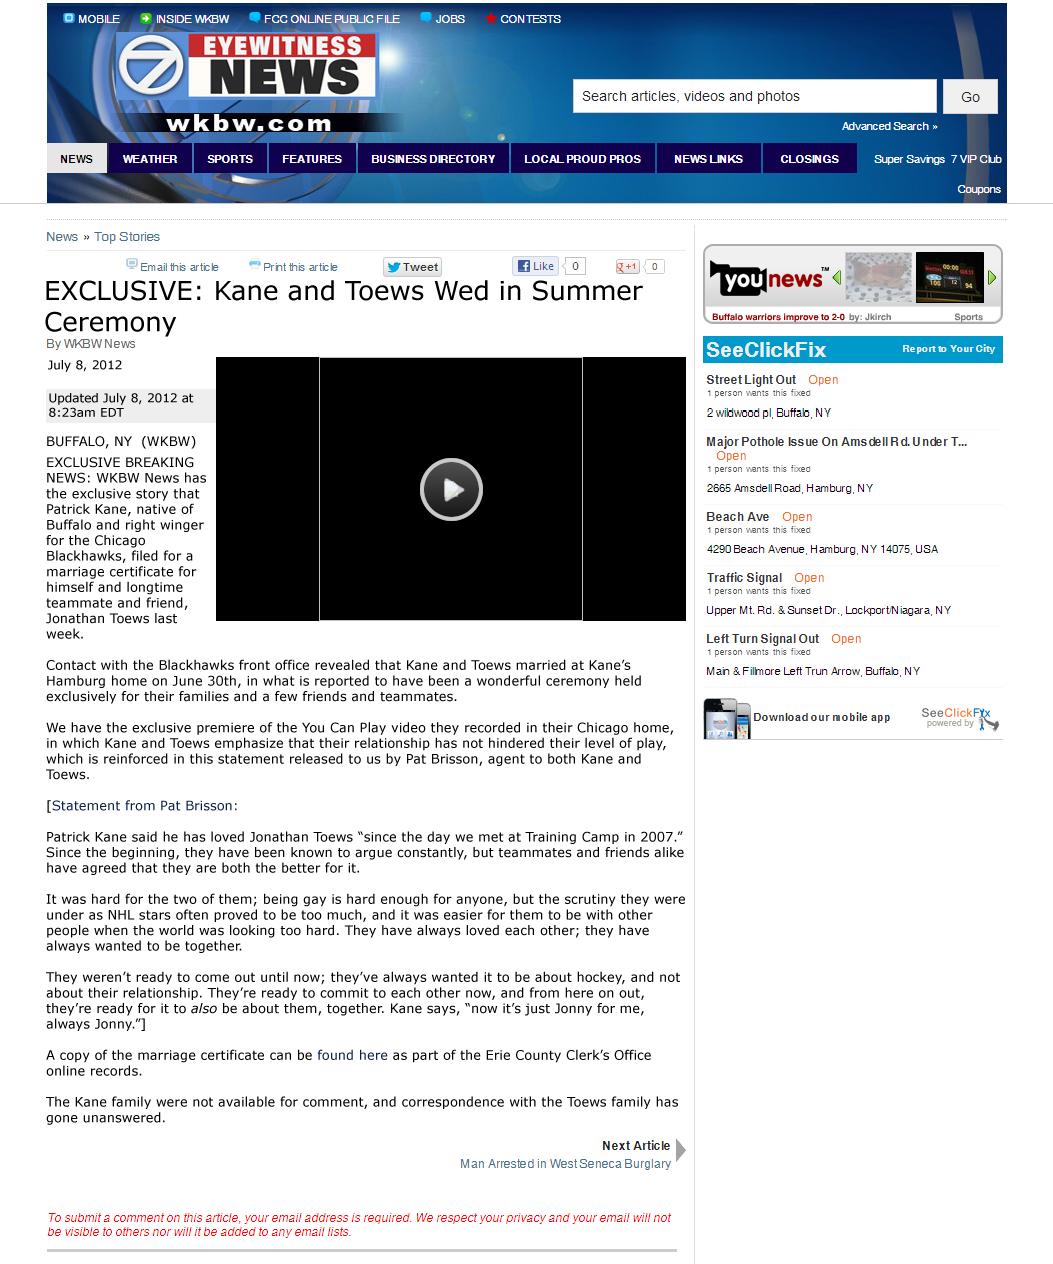 WKBW News Screencap